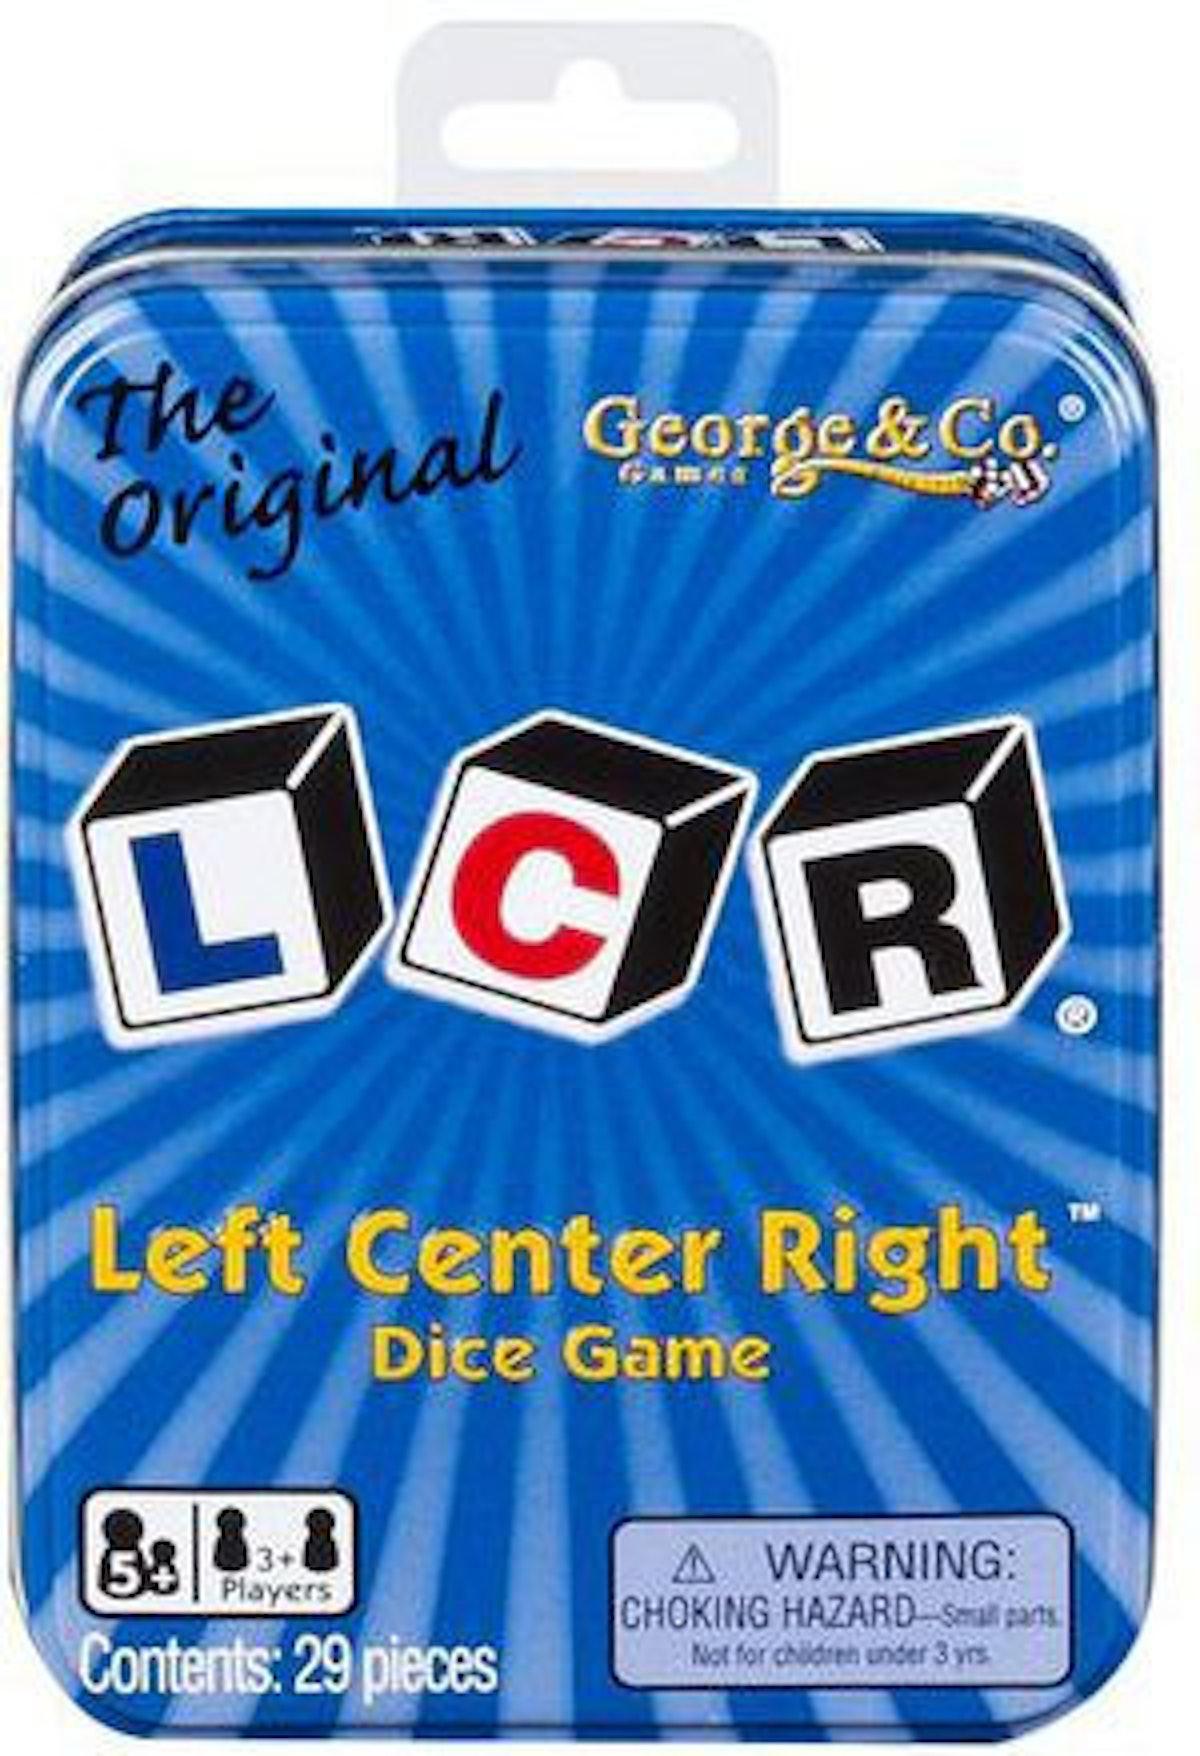 LCR® Left Center Right Dice Game Blue Tin Original